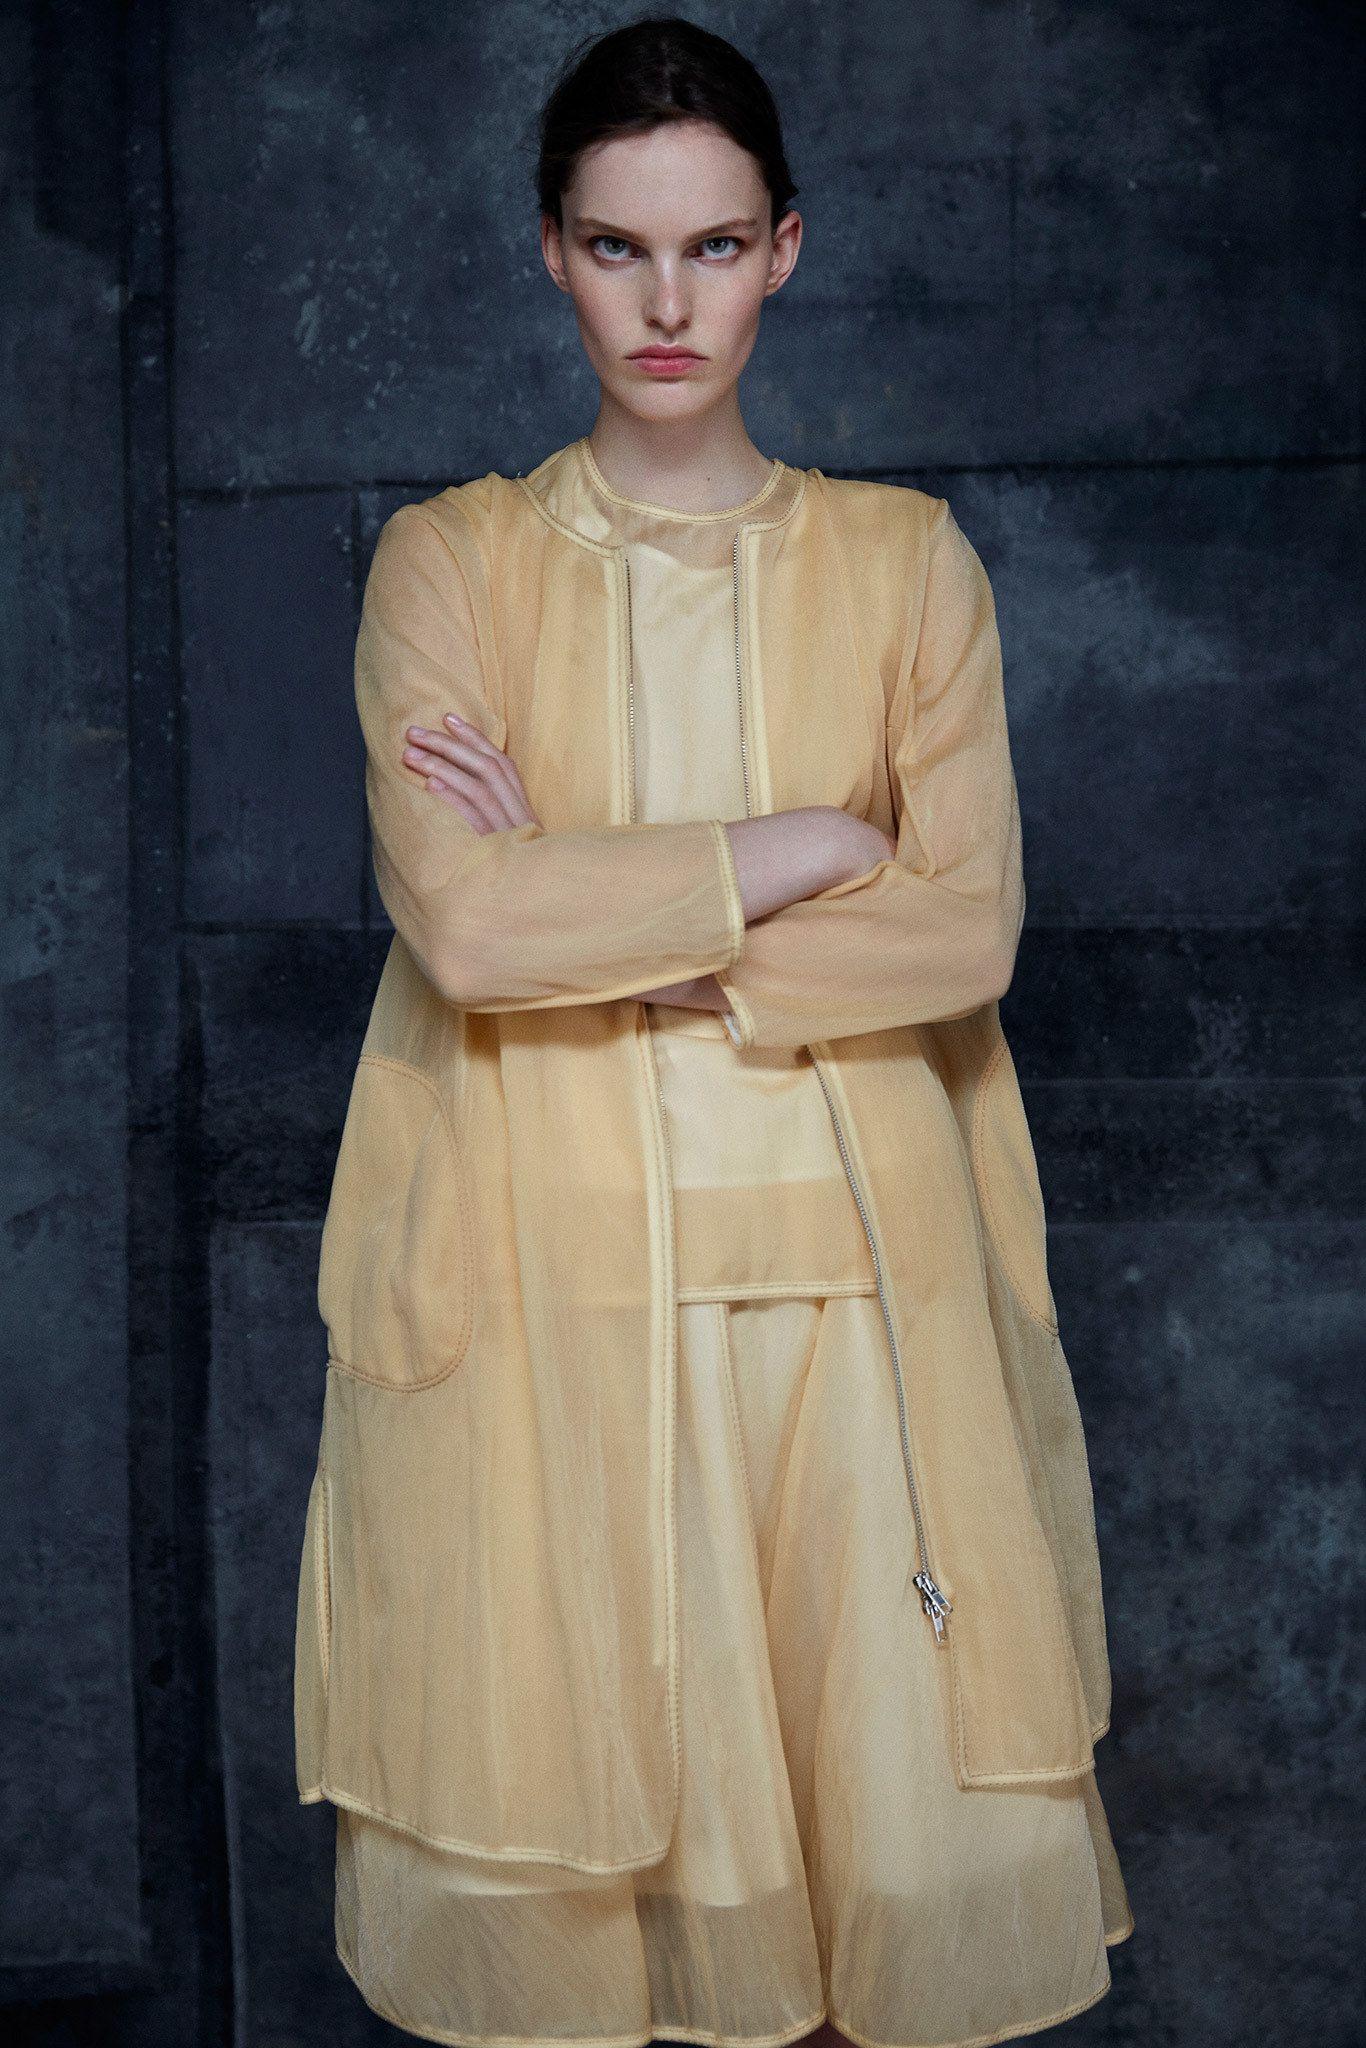 http://www.vogue.com/fashion-shows/resort-2015/ter-et-bantine/slideshow/collection